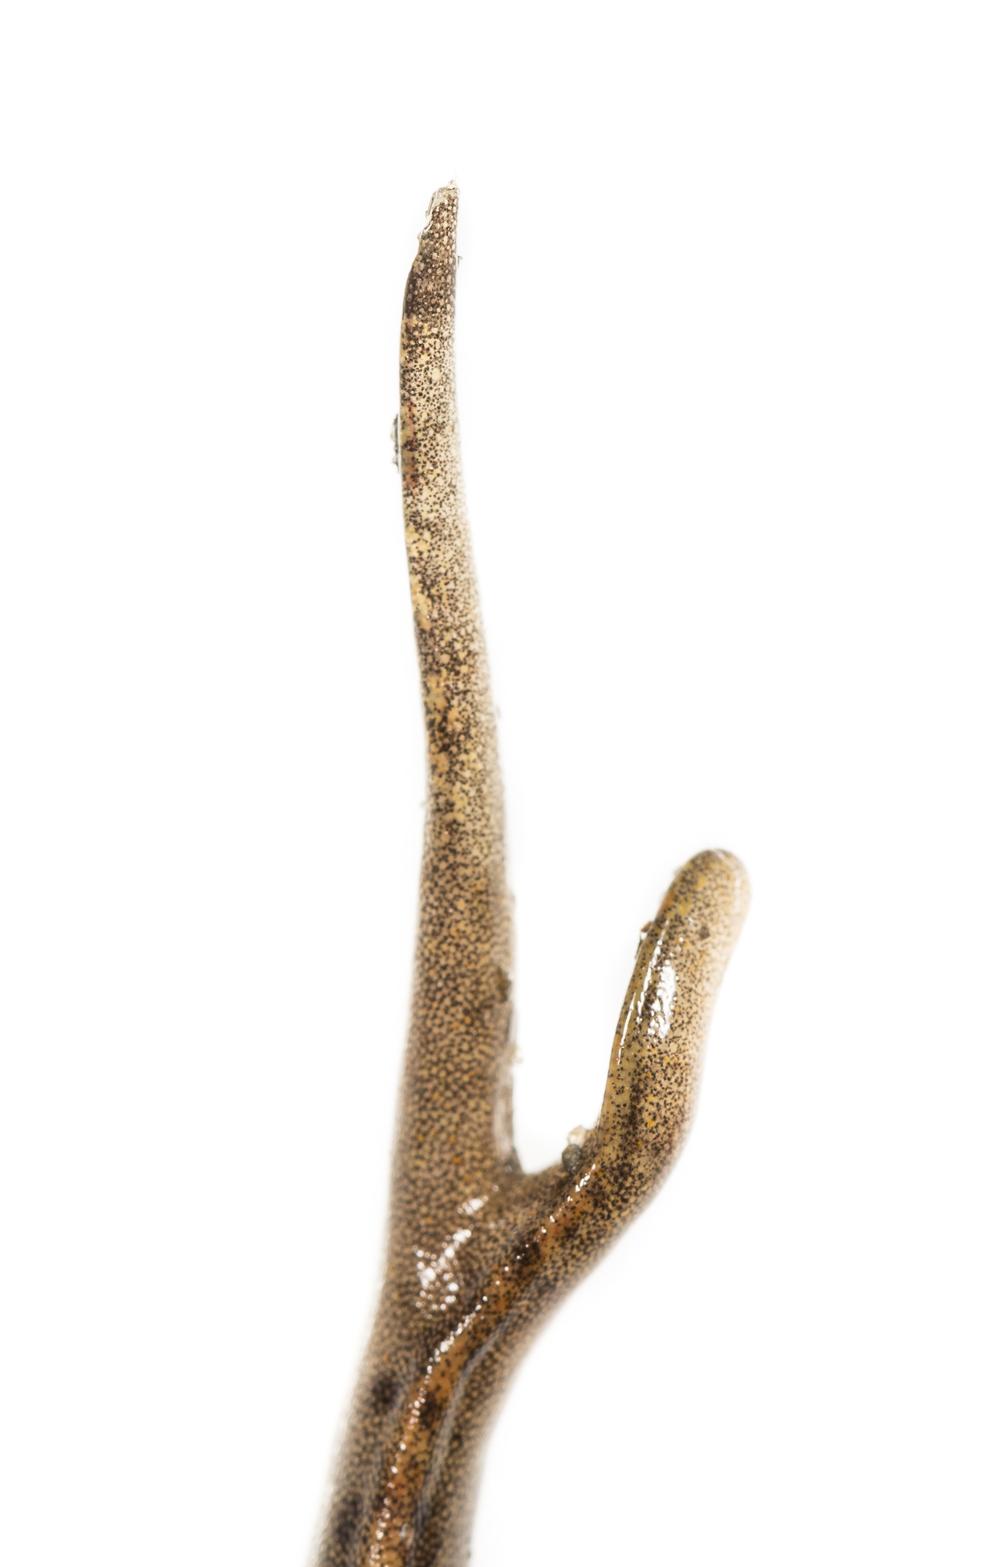 Allegheny Mountain Dusky Salamander - Desmognathus ochrophaeus